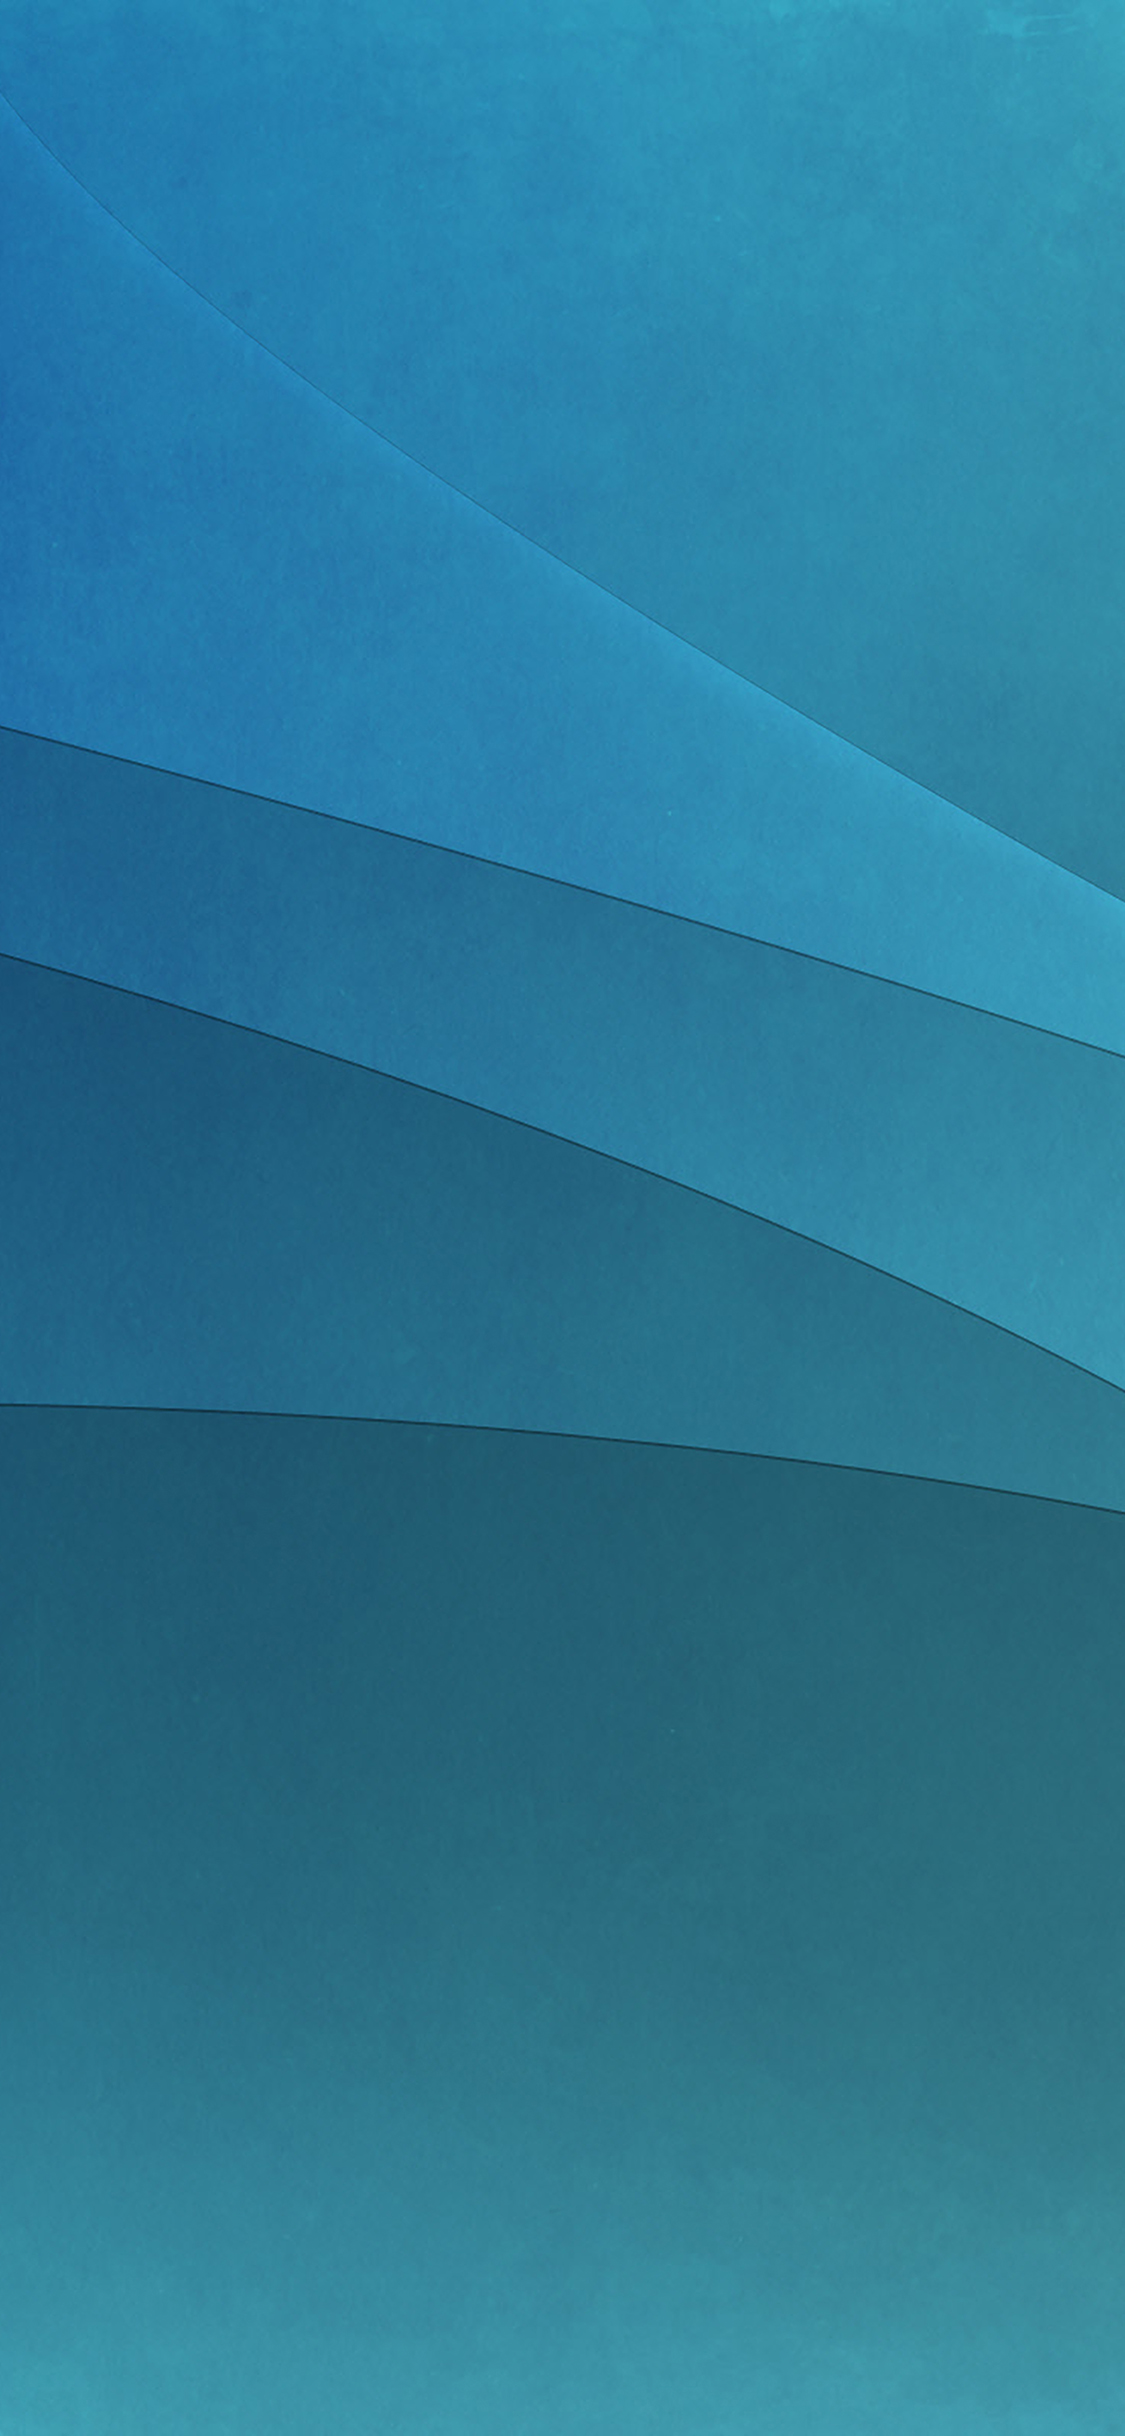 iPhoneXpapers.com-Apple-iPhone-wallpaper-vd88-shining-aqua-blue-abstract-art-pattern